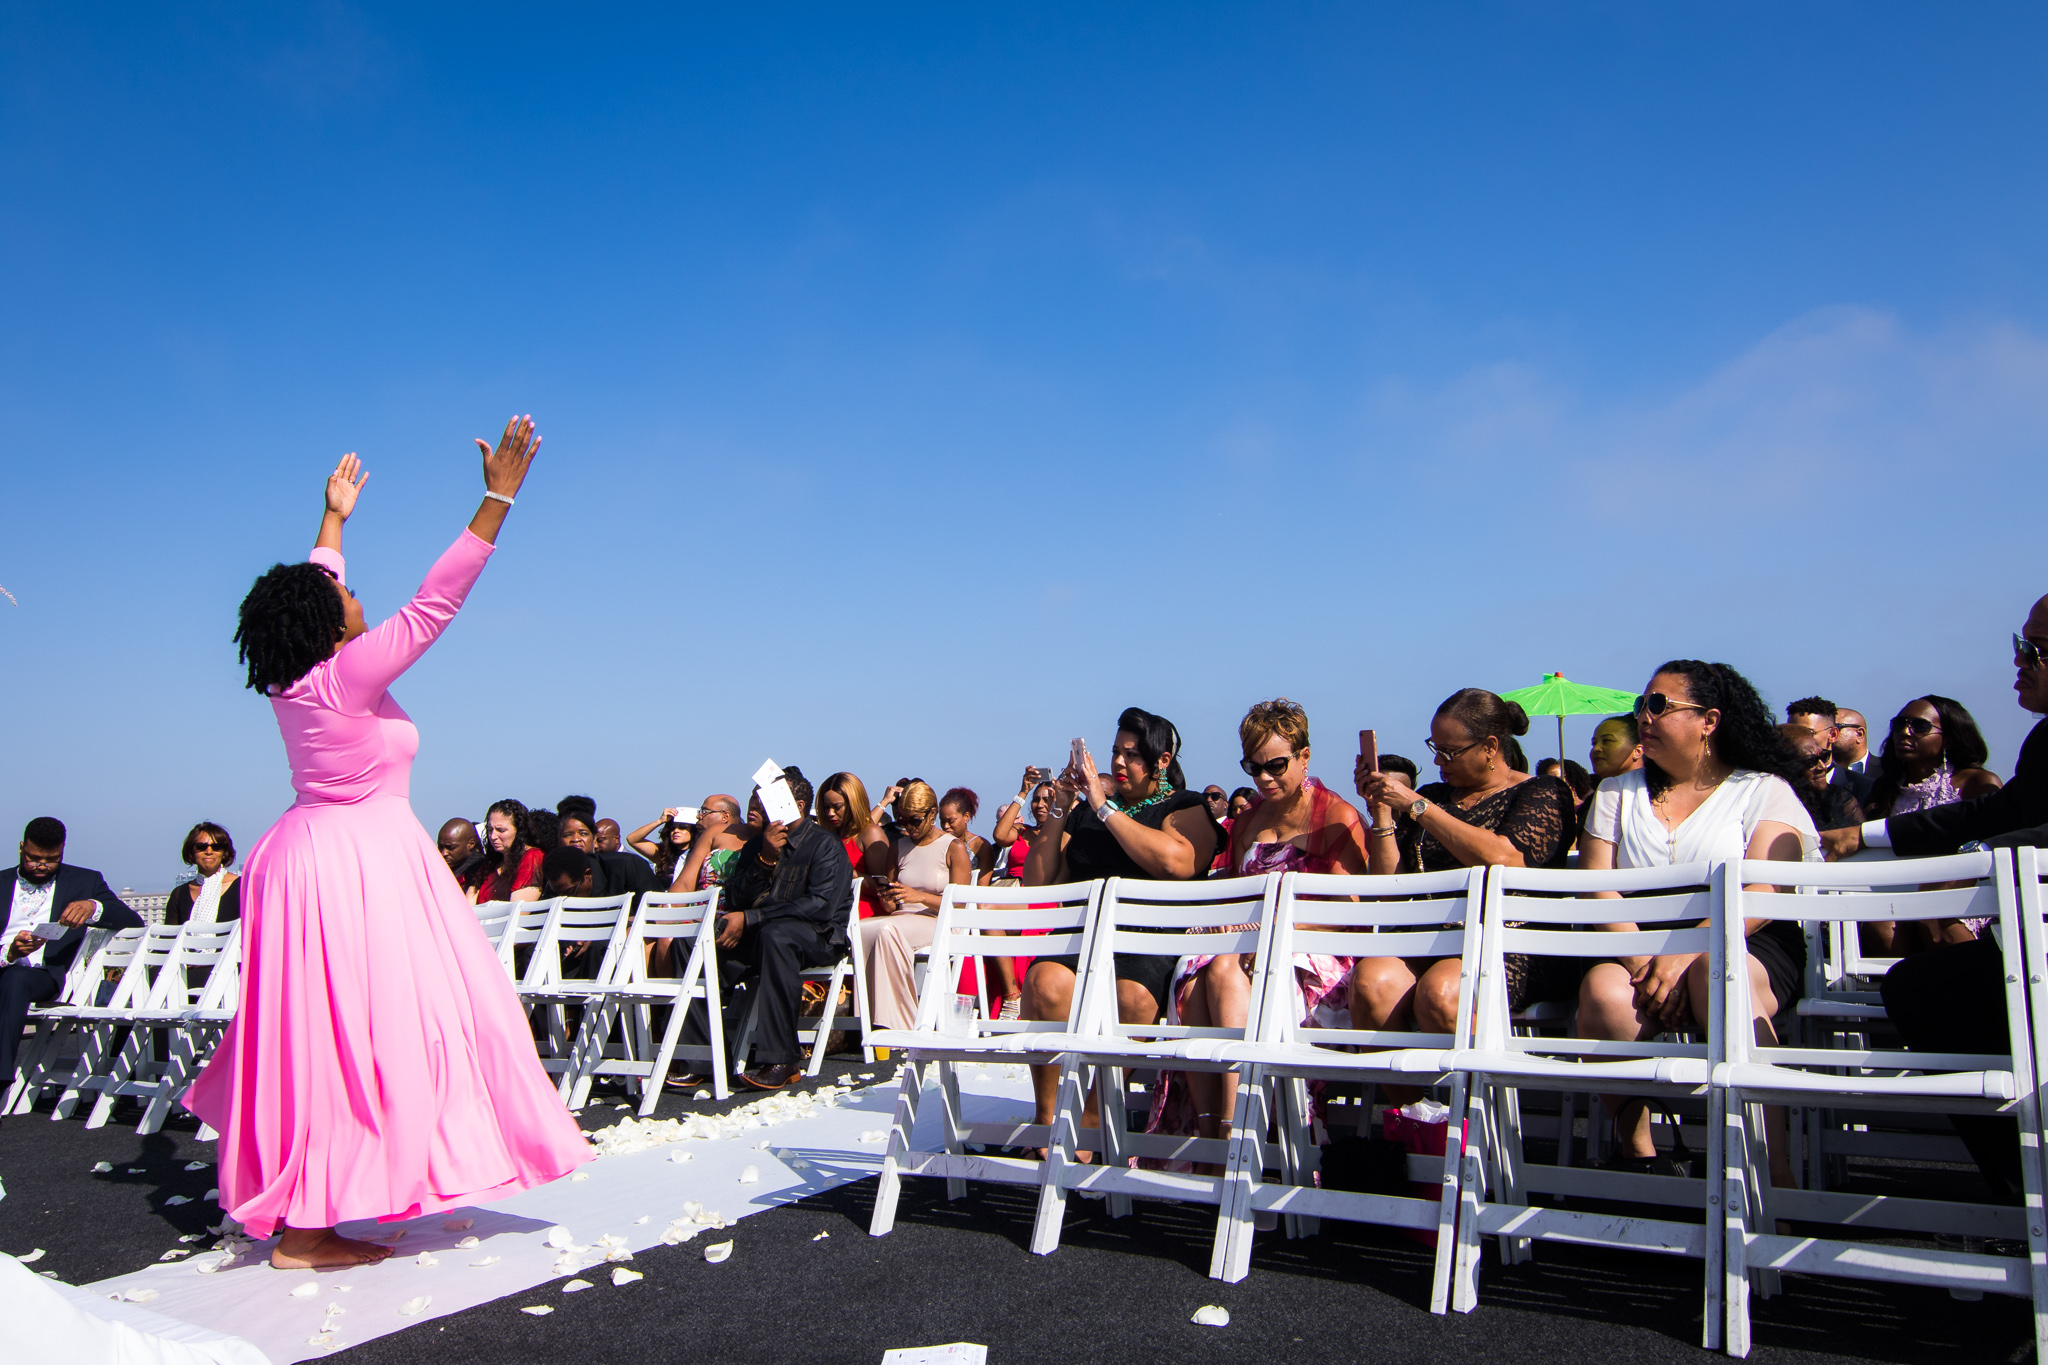 Minister Joanna Kanyali, Best friend, Bridesmaid Praise Dancing @ #GambrellsNY2LA